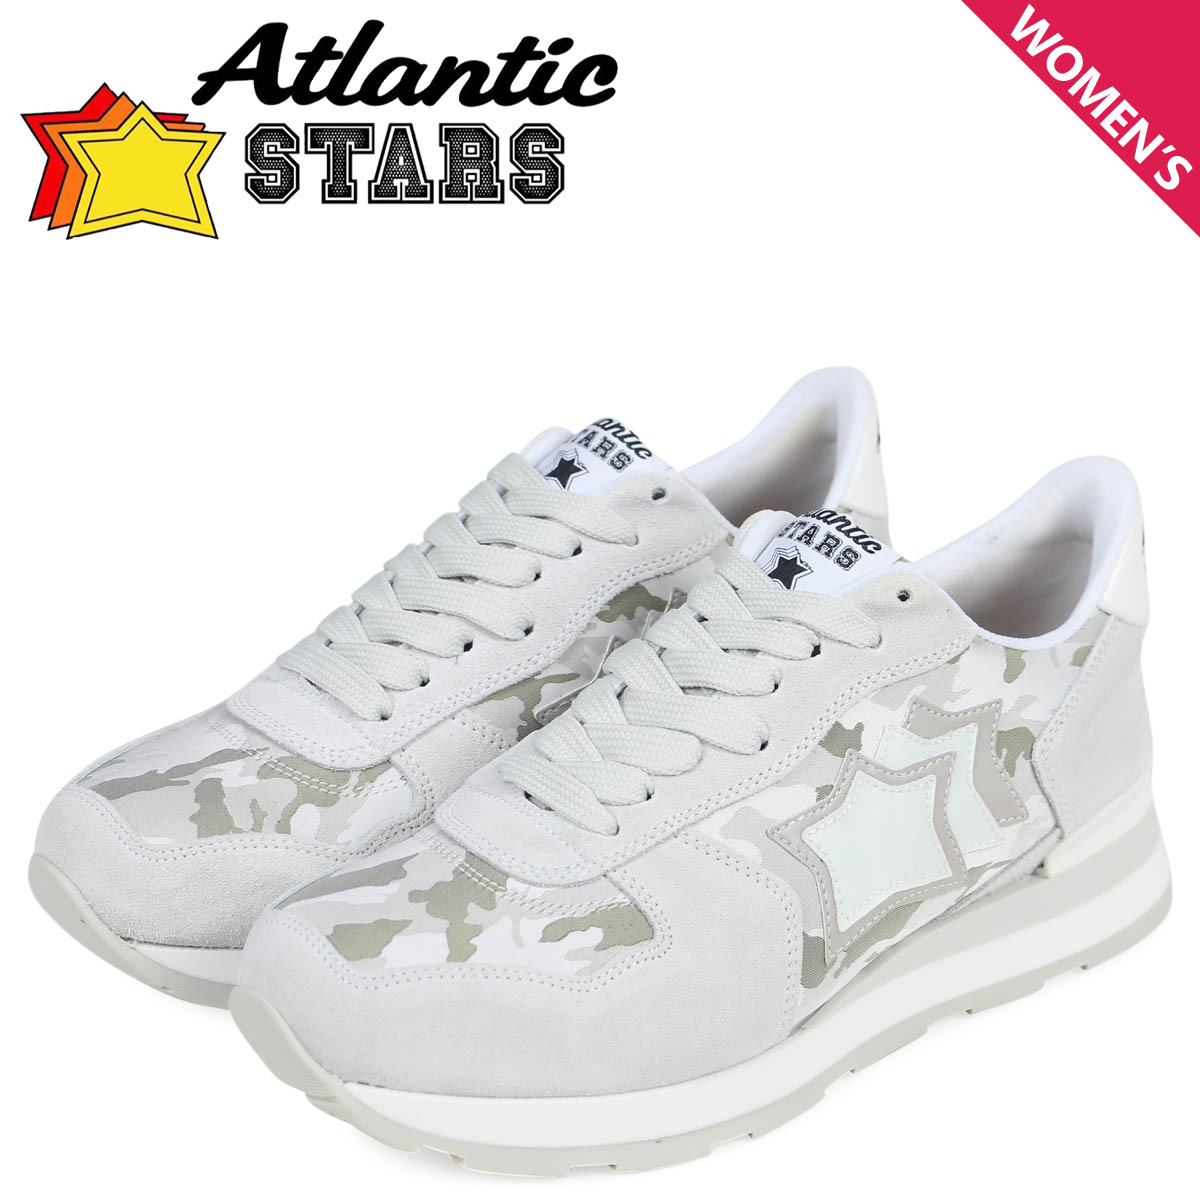 Atlantic STARS アトランティックスターズ レディース スニーカー ベガ VEGA BMB-86B ホワイト